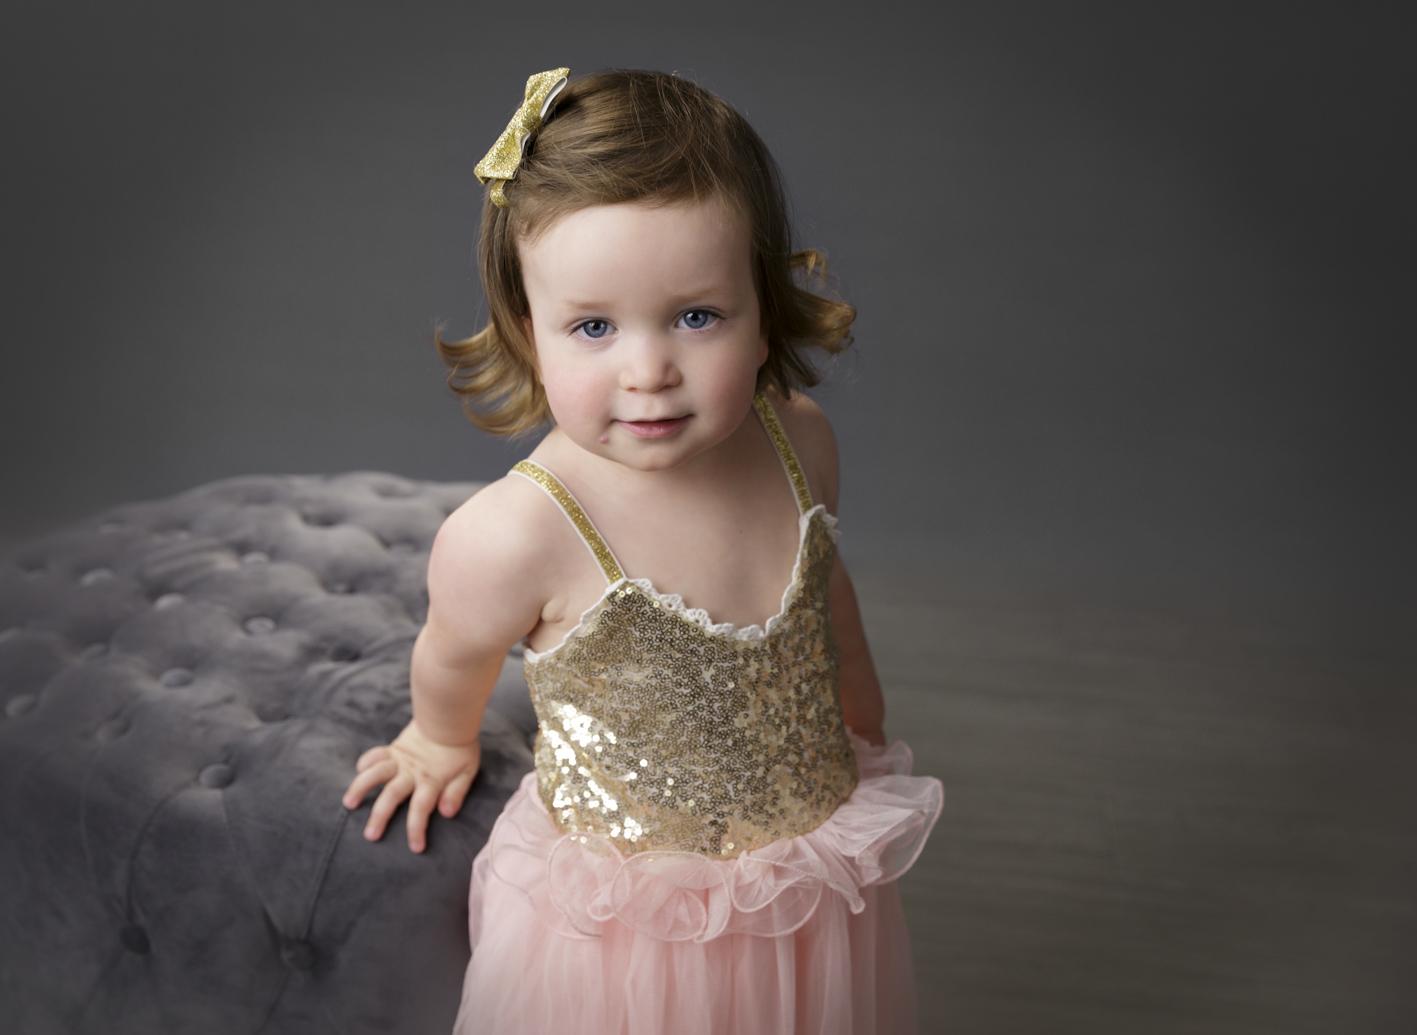 gorgeous girl in ballerina dress